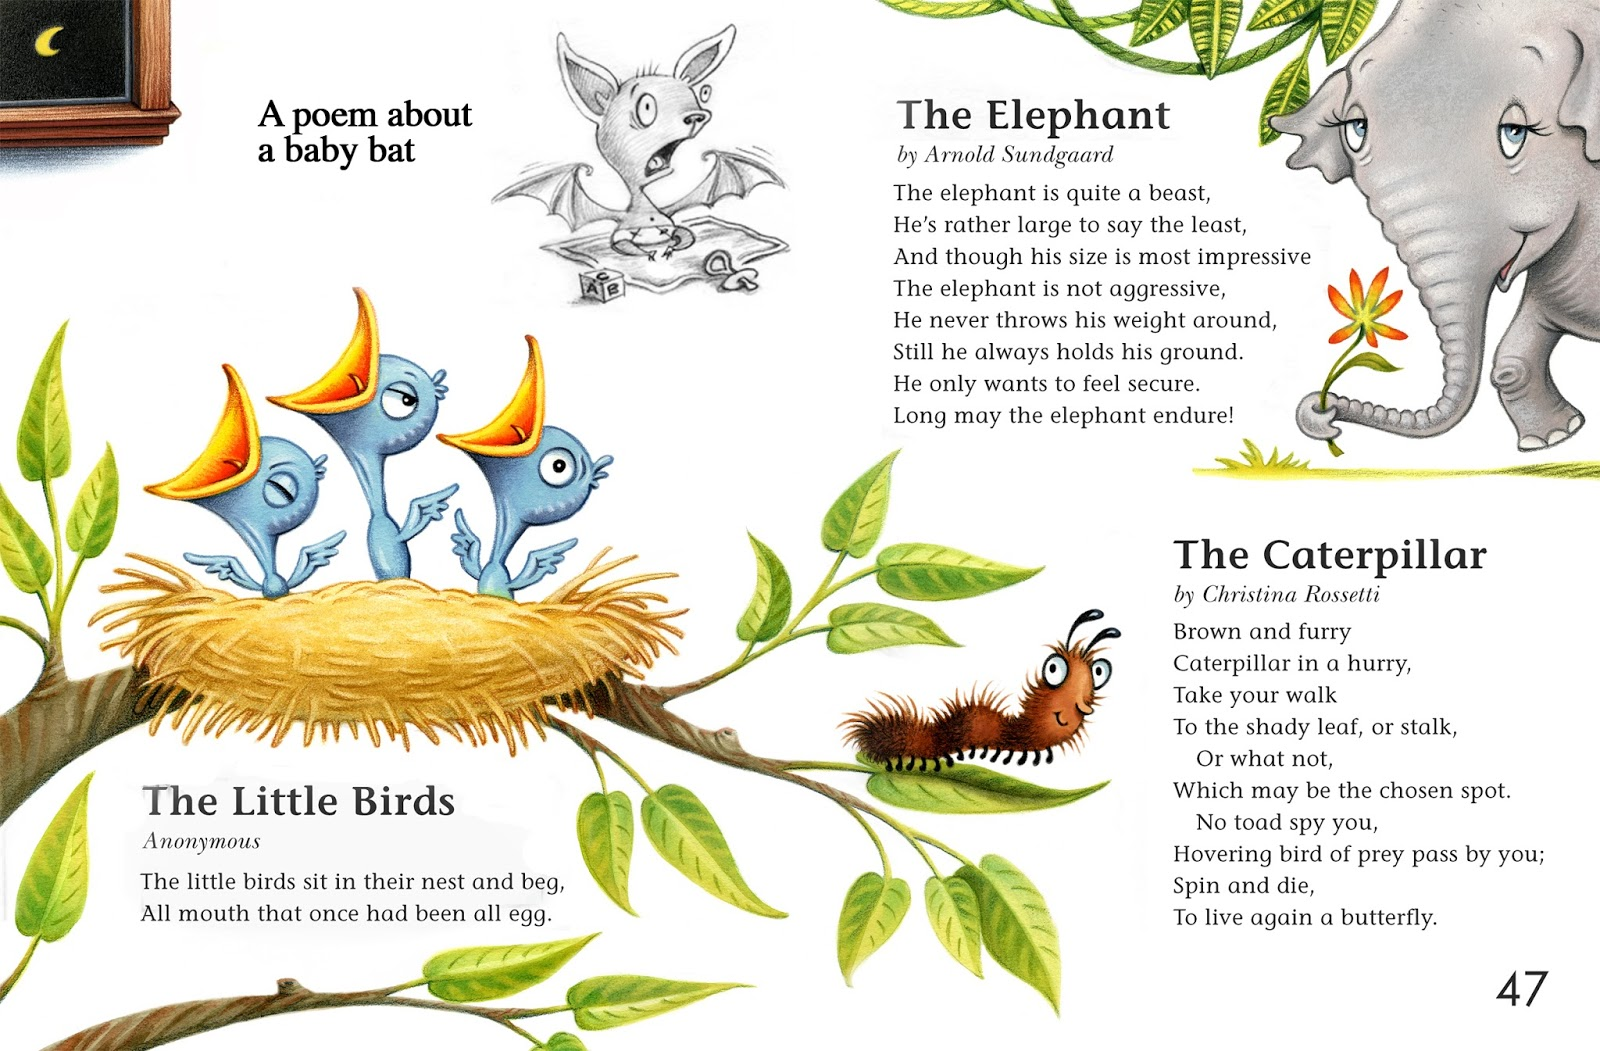 Debbie palen illustration shel. Caterpillar clipart poem